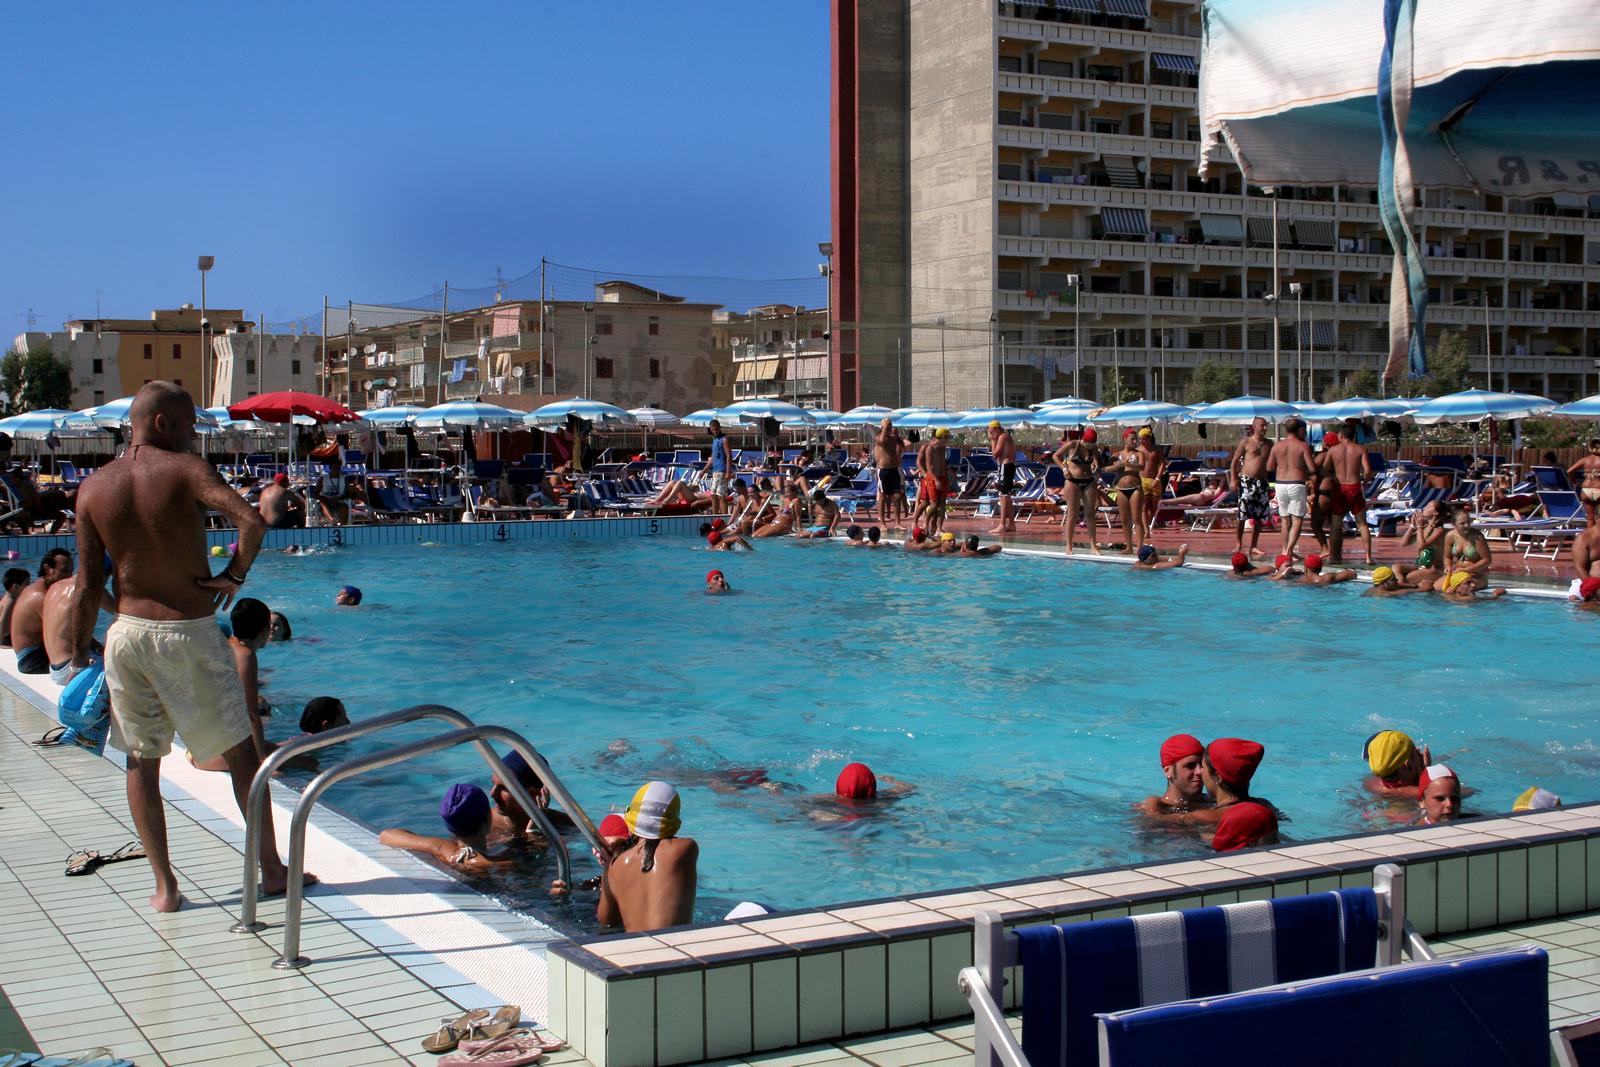 Angolo piscina